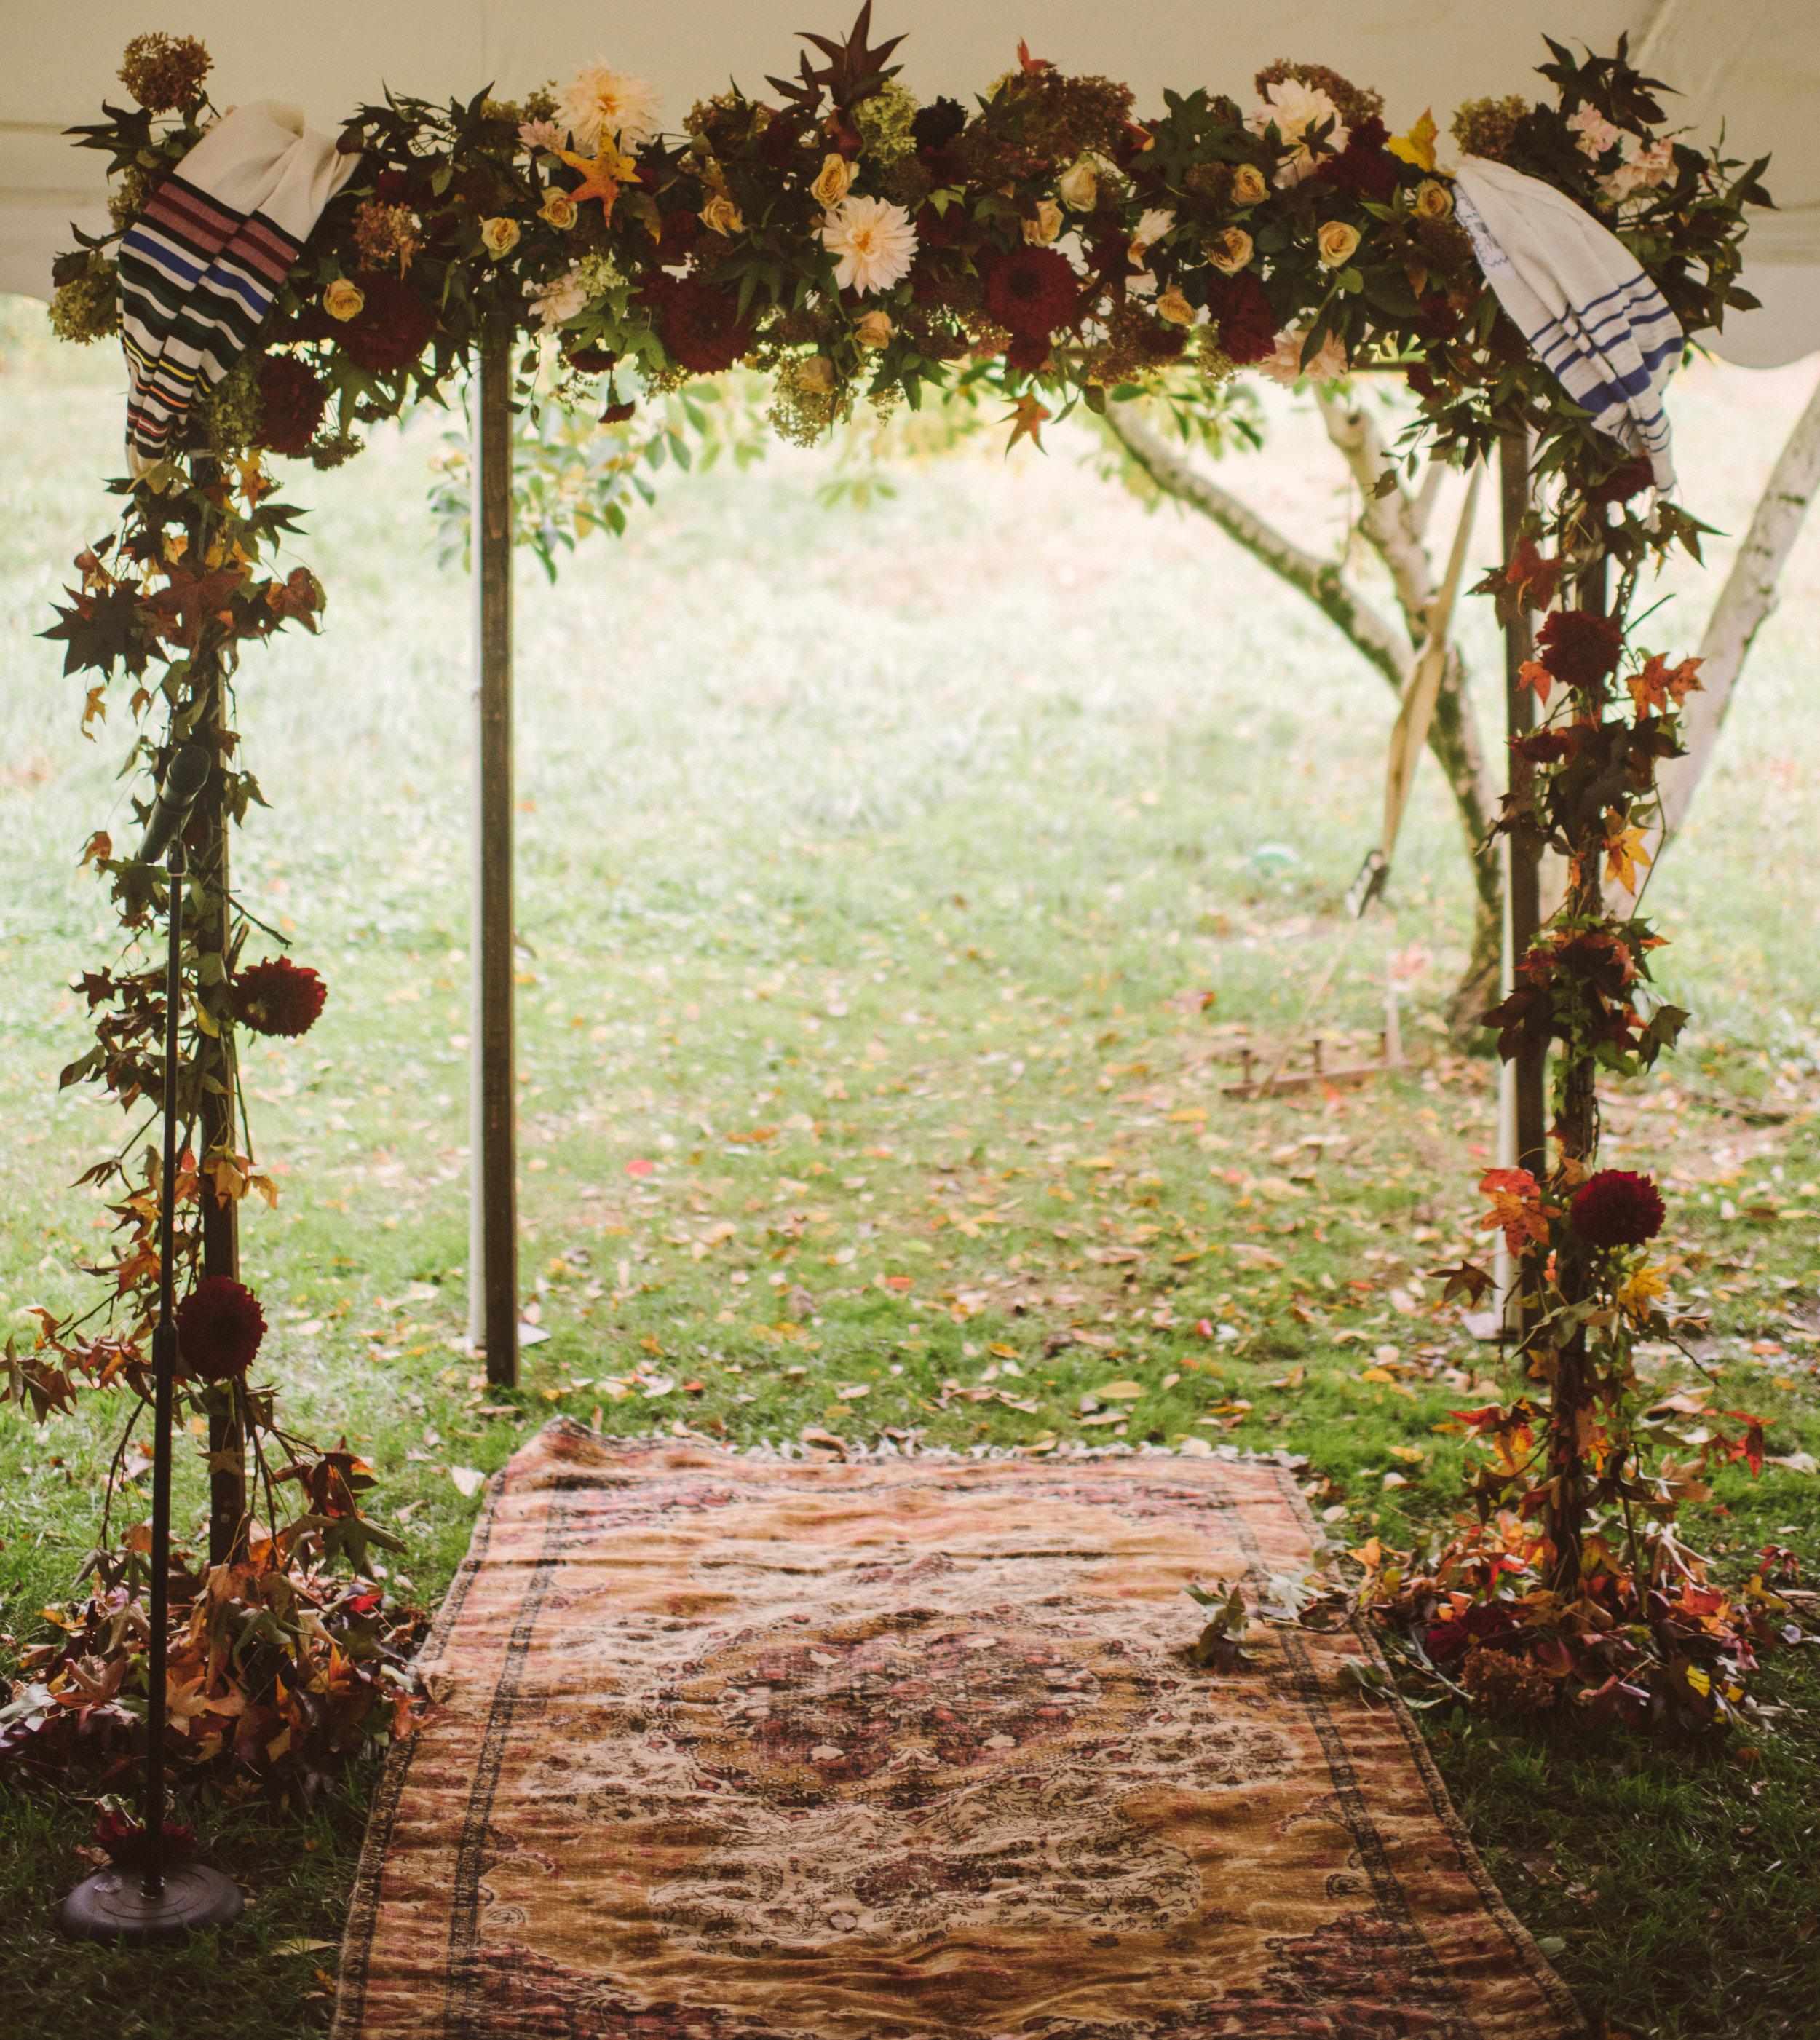 JACQUELINE & ANDREW WARSHAWER -BROOKMILL FARM FALL WEDDING - INTIMATE WEDDING PHOTOGRAPHER - TWOTWENTY by CHI-CHI AGBIM-159.jpg